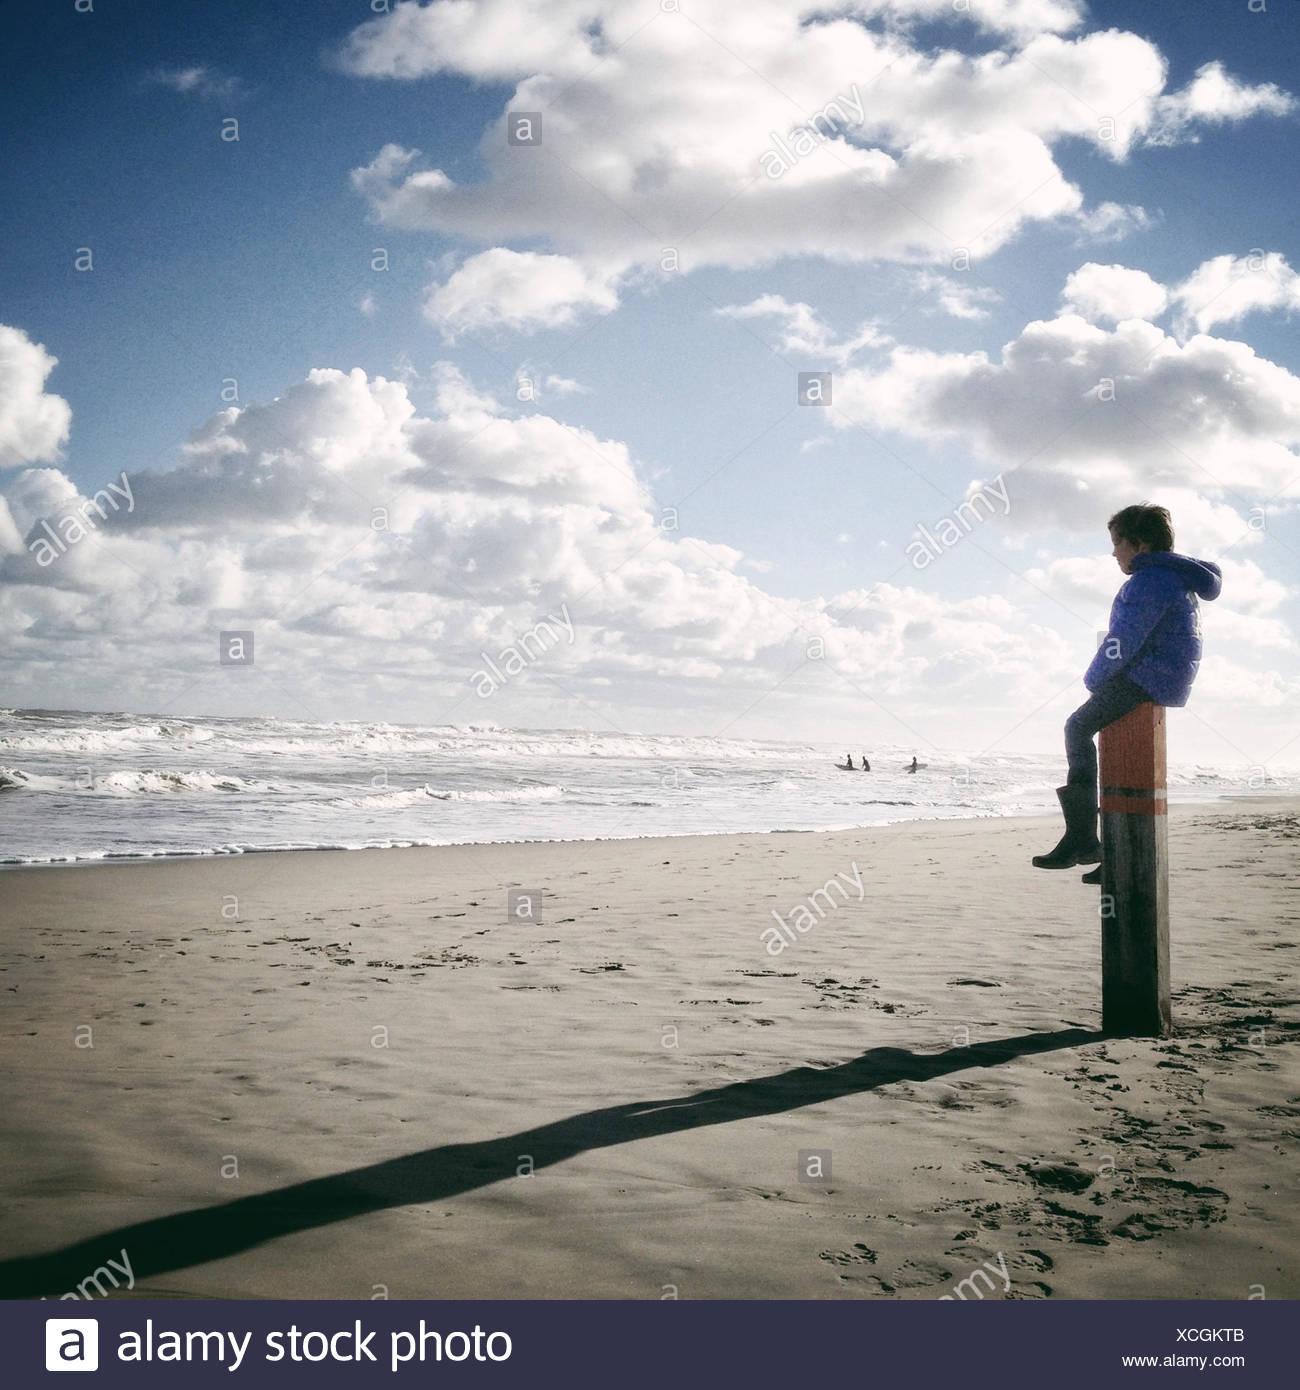 Boy sitting on wooden post on beach - Stock Image